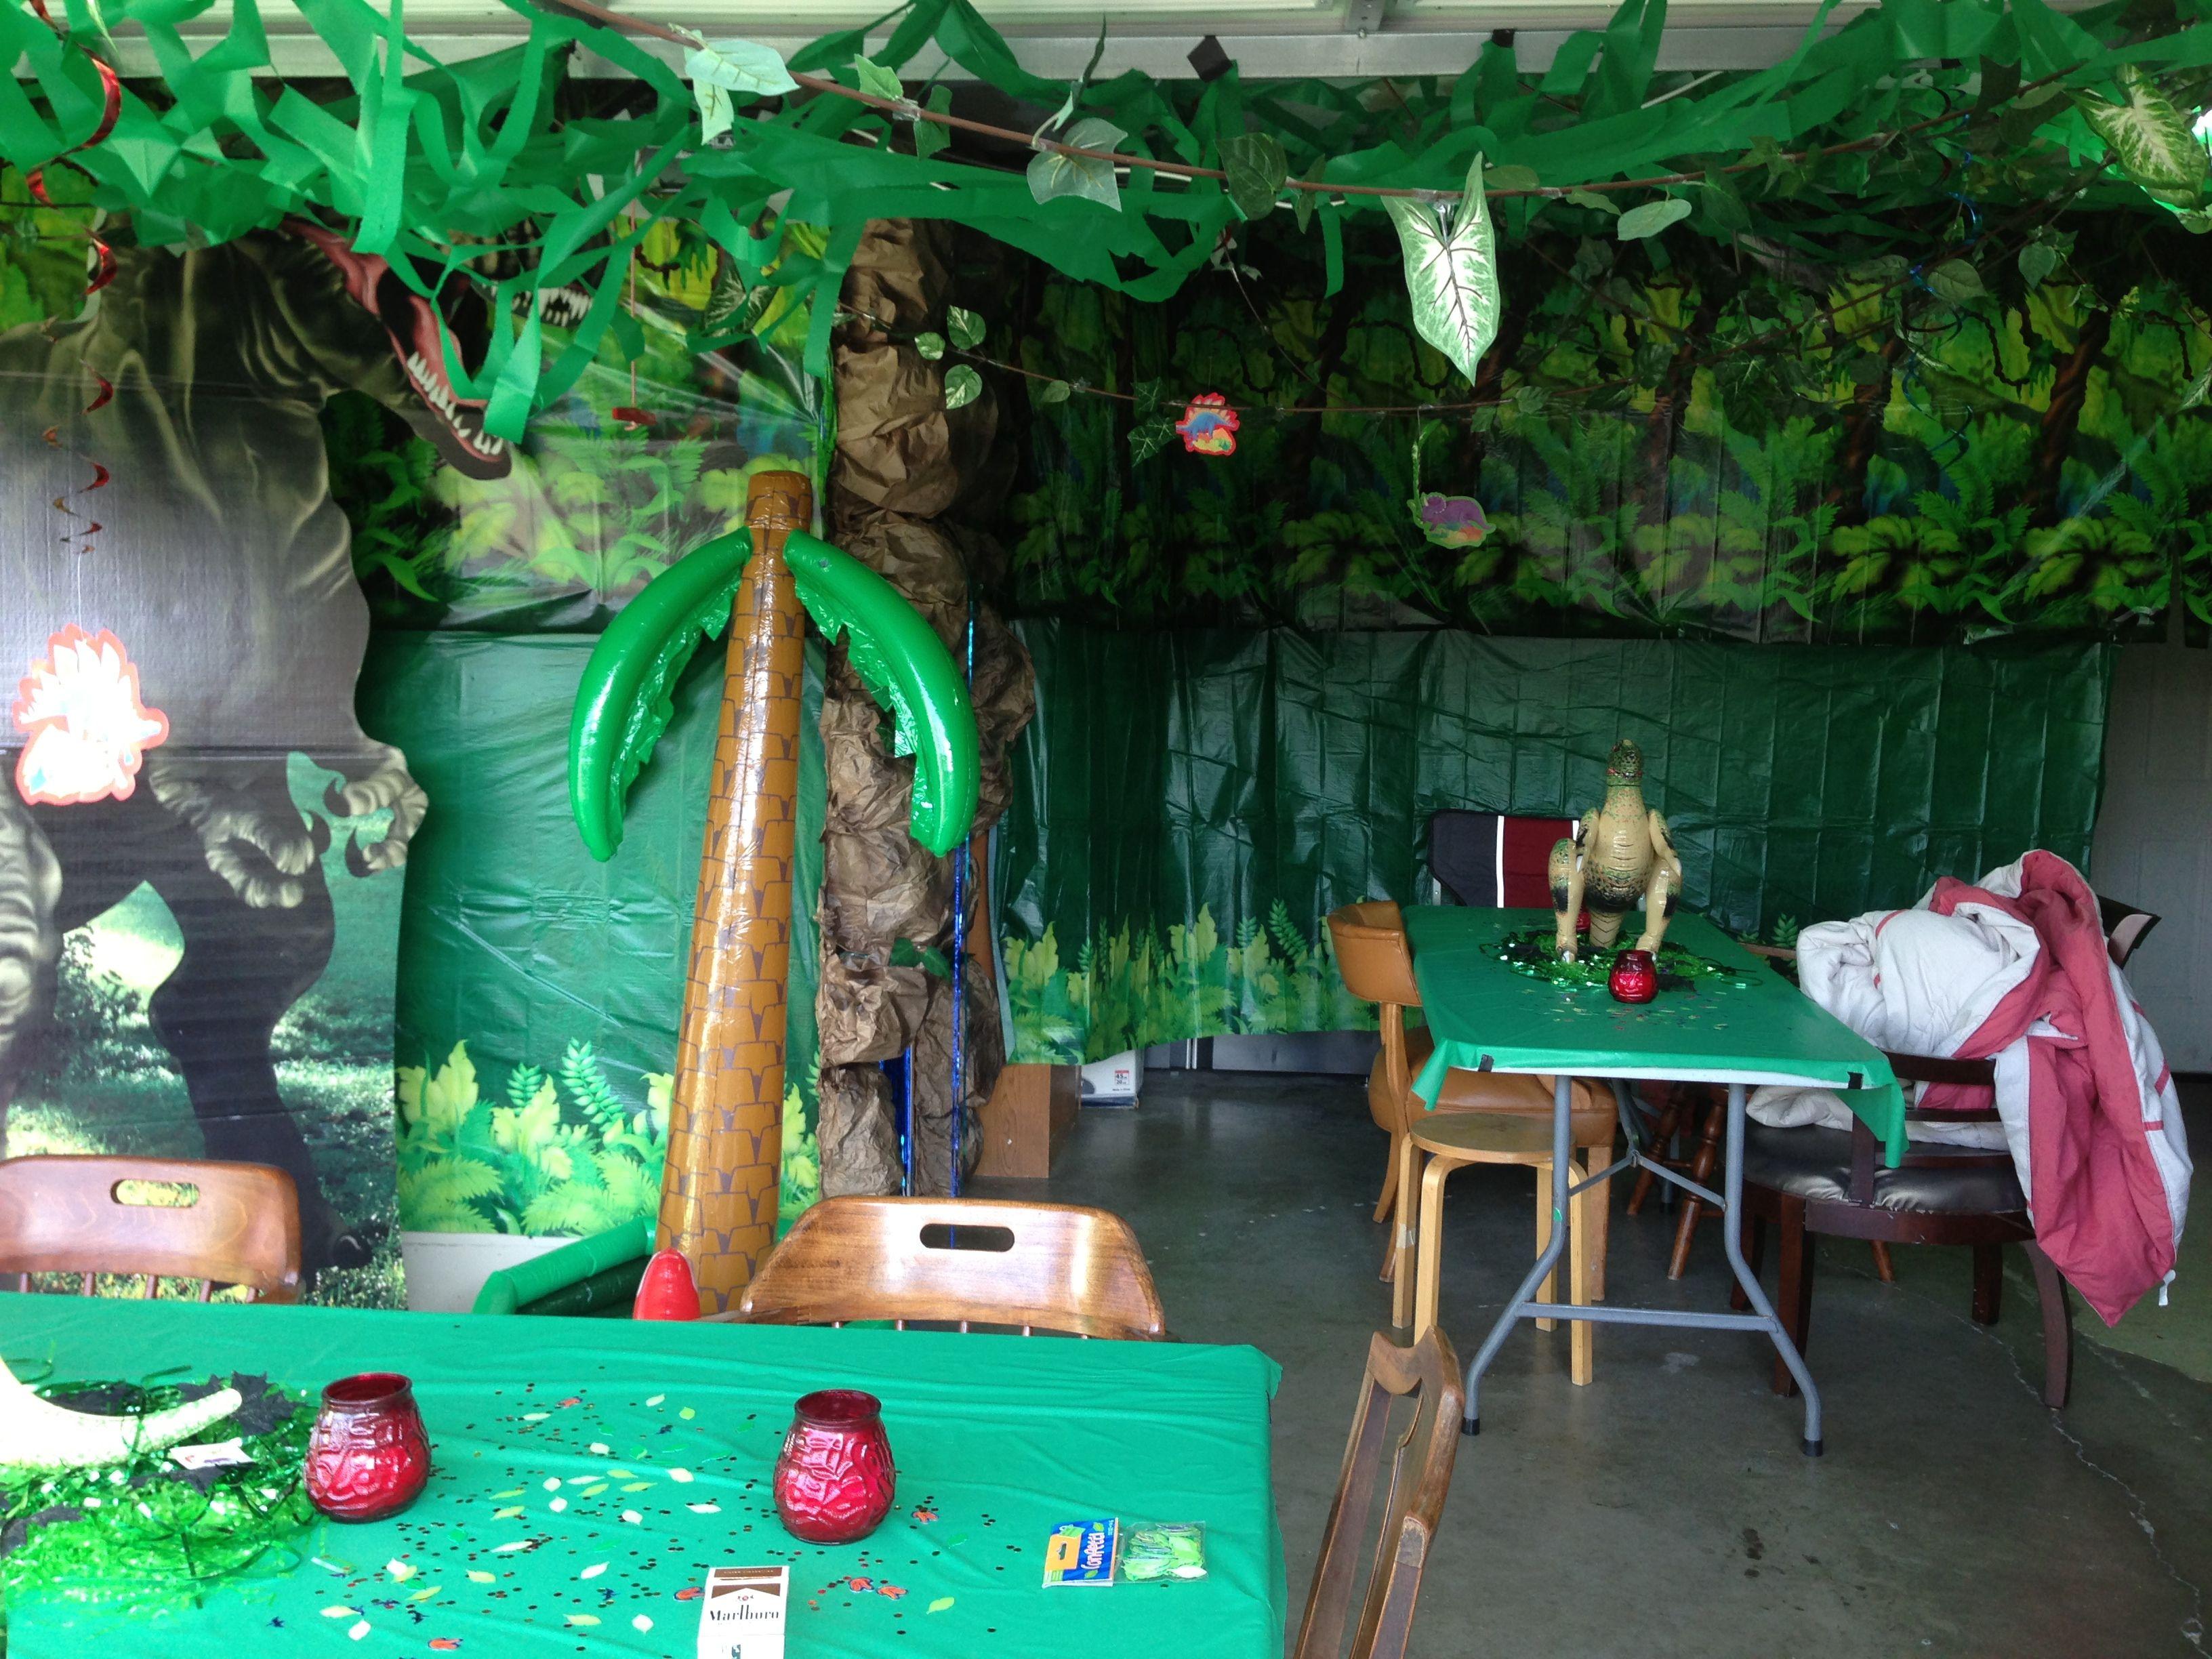 Shy Dinosaurs Photography Background Safari Jungle Theme Birthday Party Background Tropical Shy Dinosaurs Cake Table Decoration